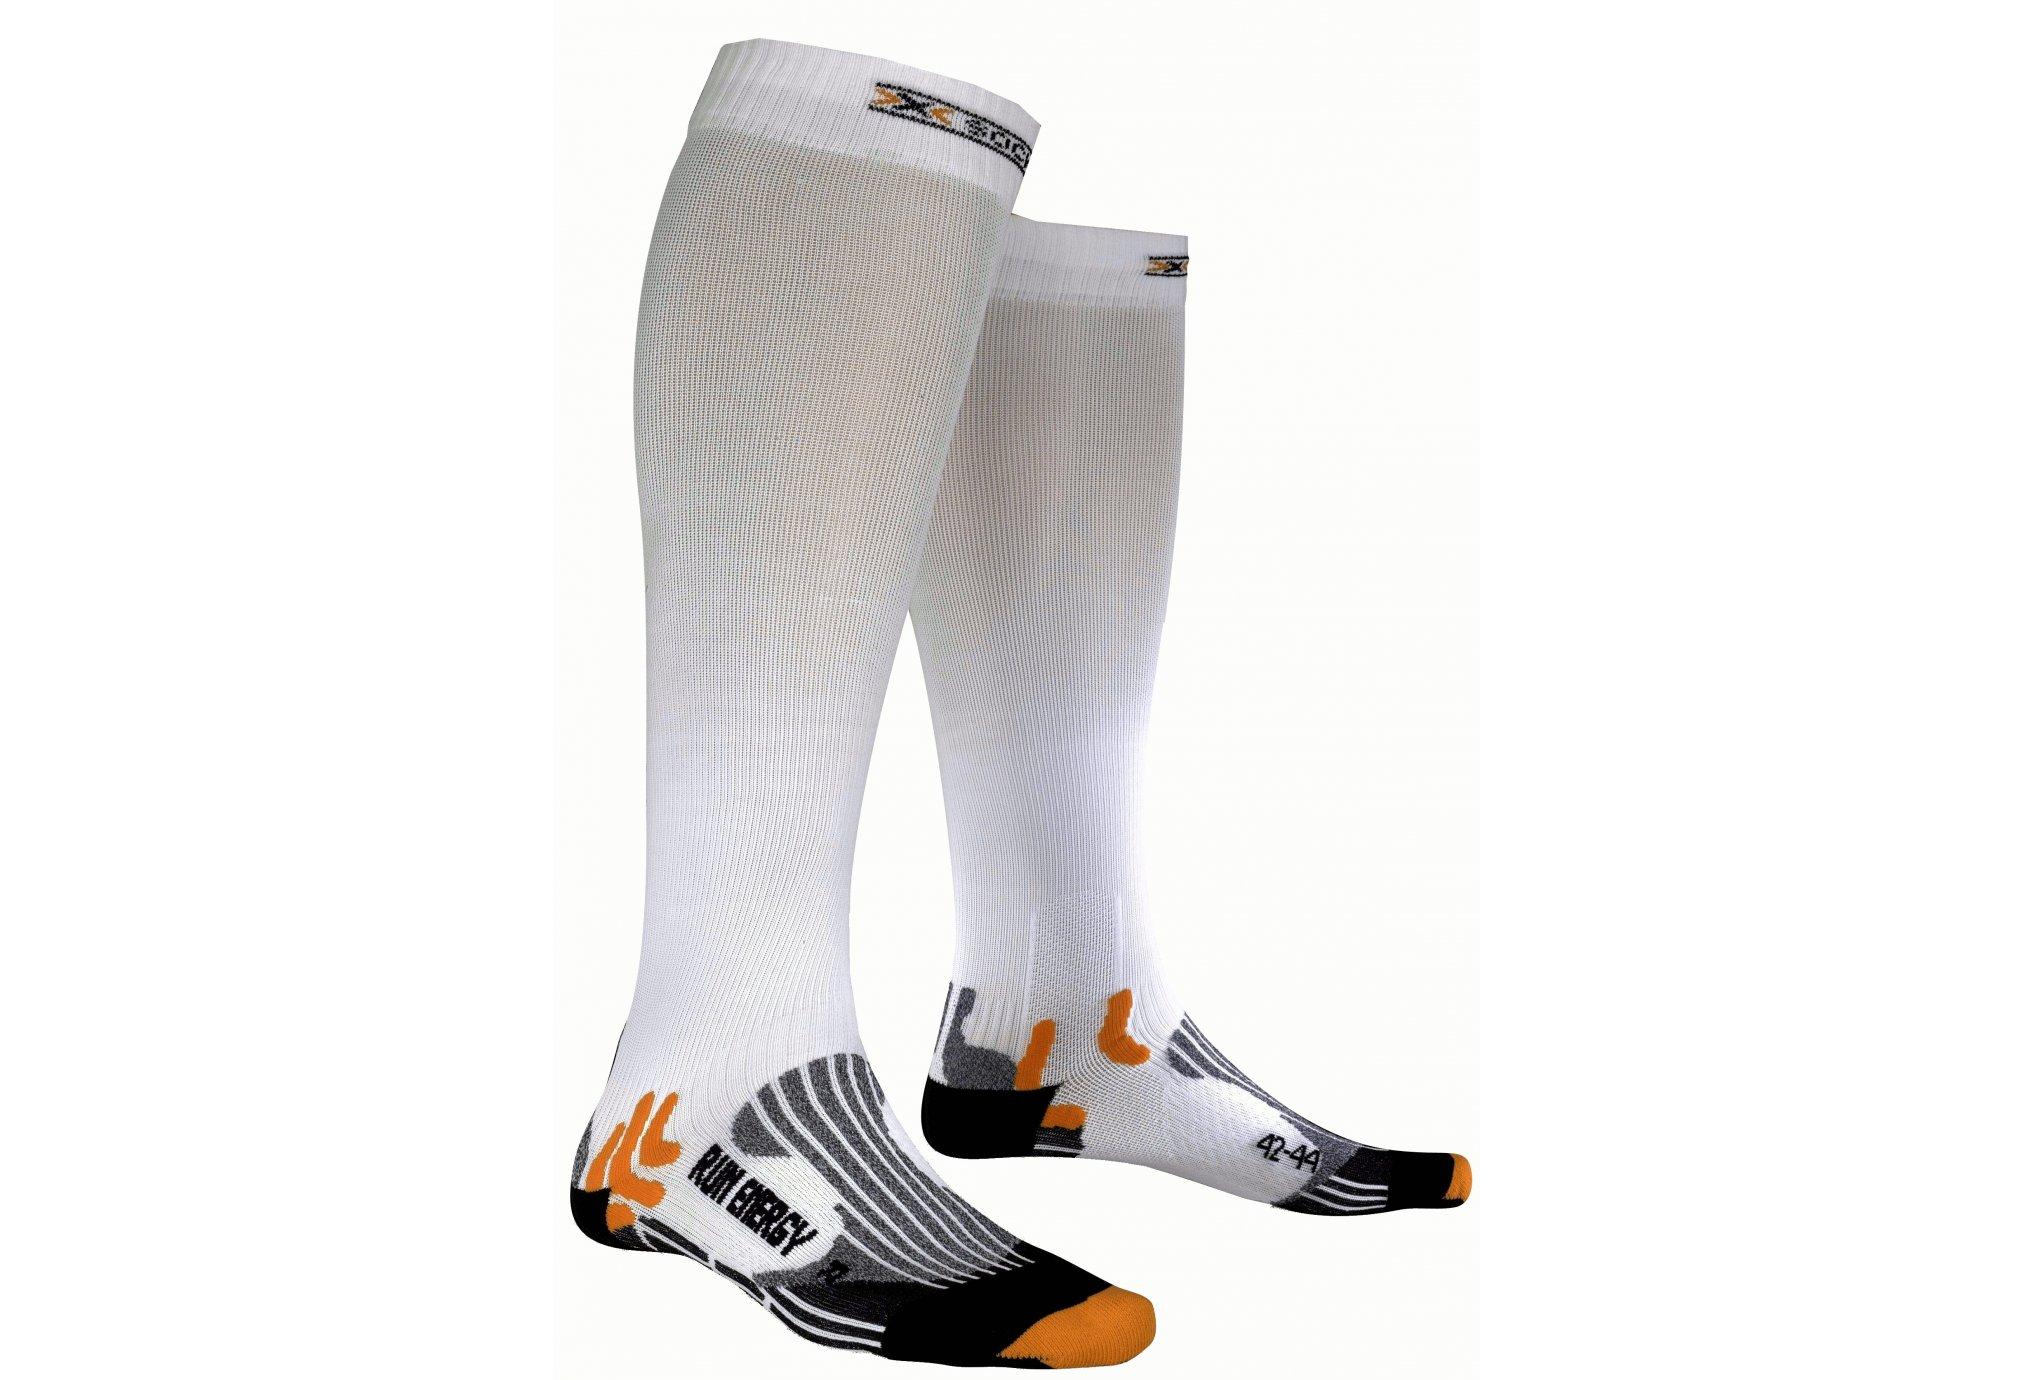 X-SOCKS Run Energizer Homme Chaussettes